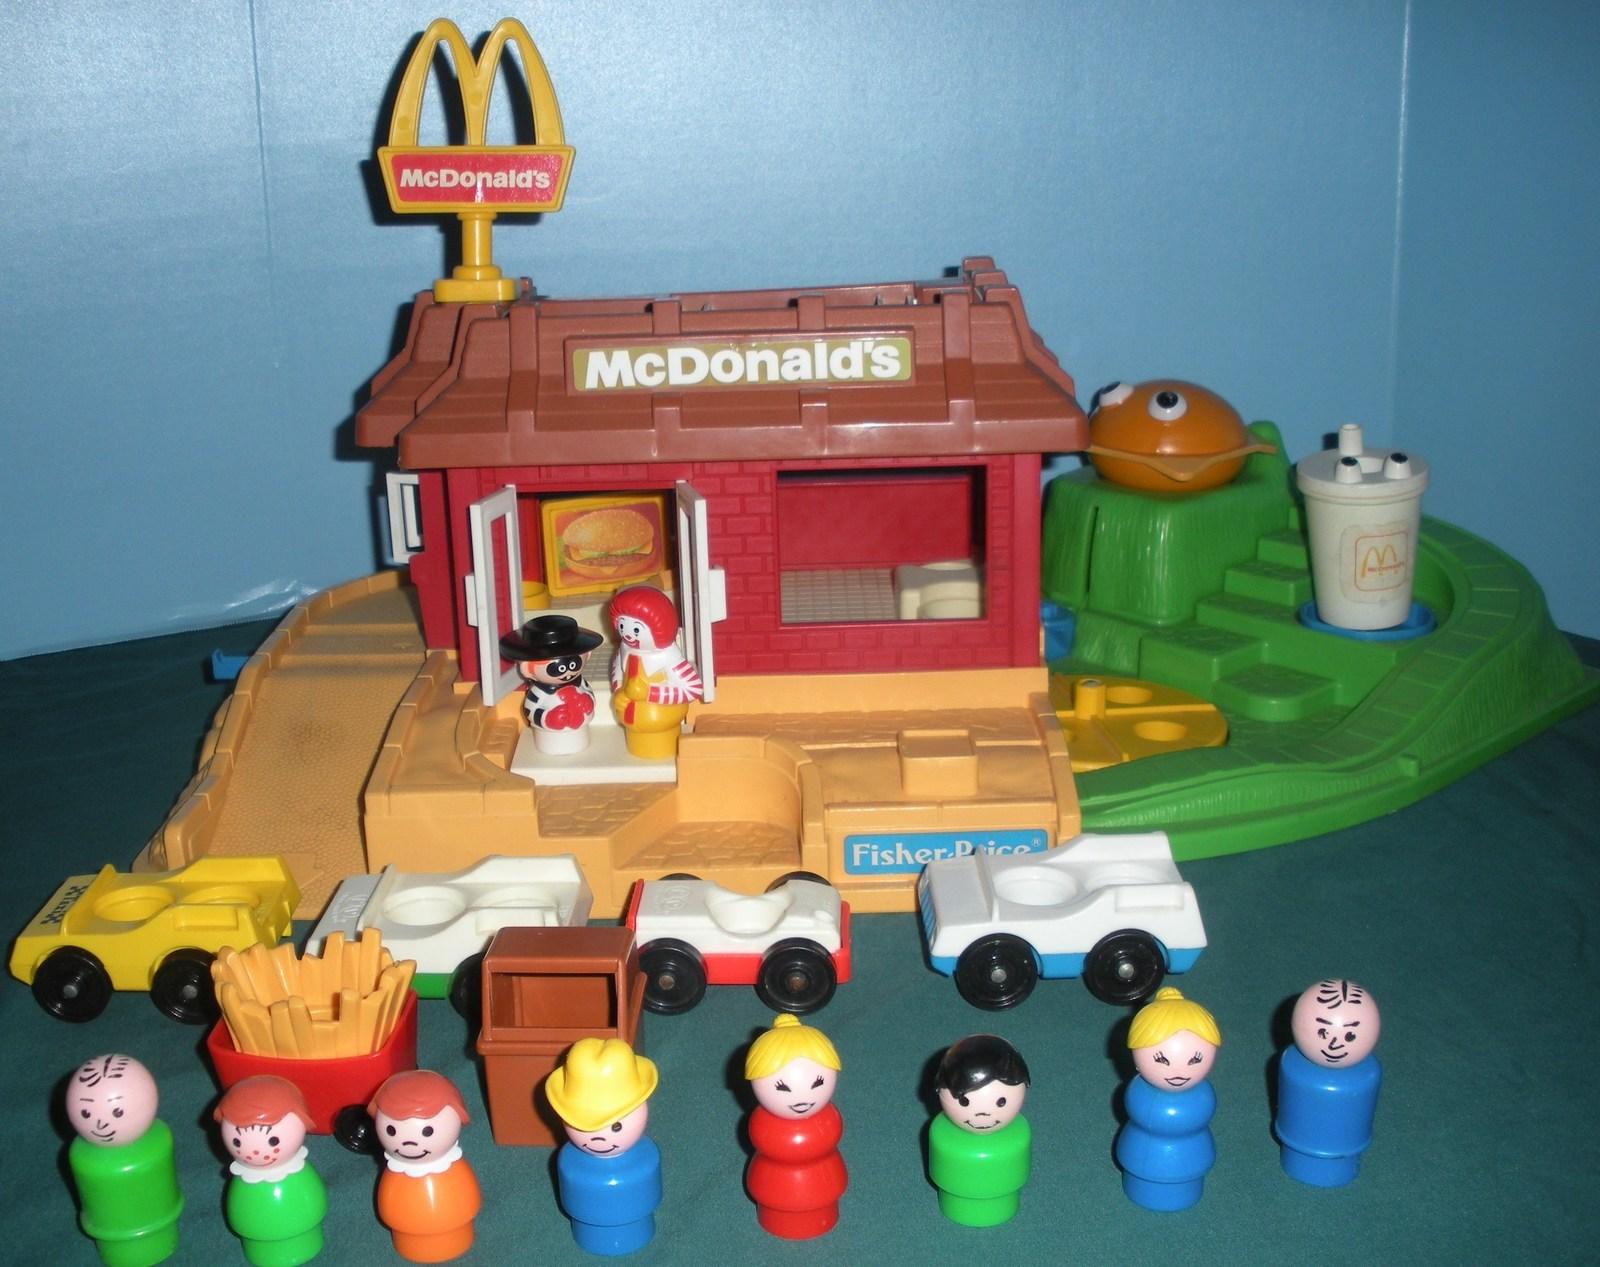 Vintage Fisher Price #2552 McDonald's Play Set Complete + BONUS!/VG++-EXC (N)